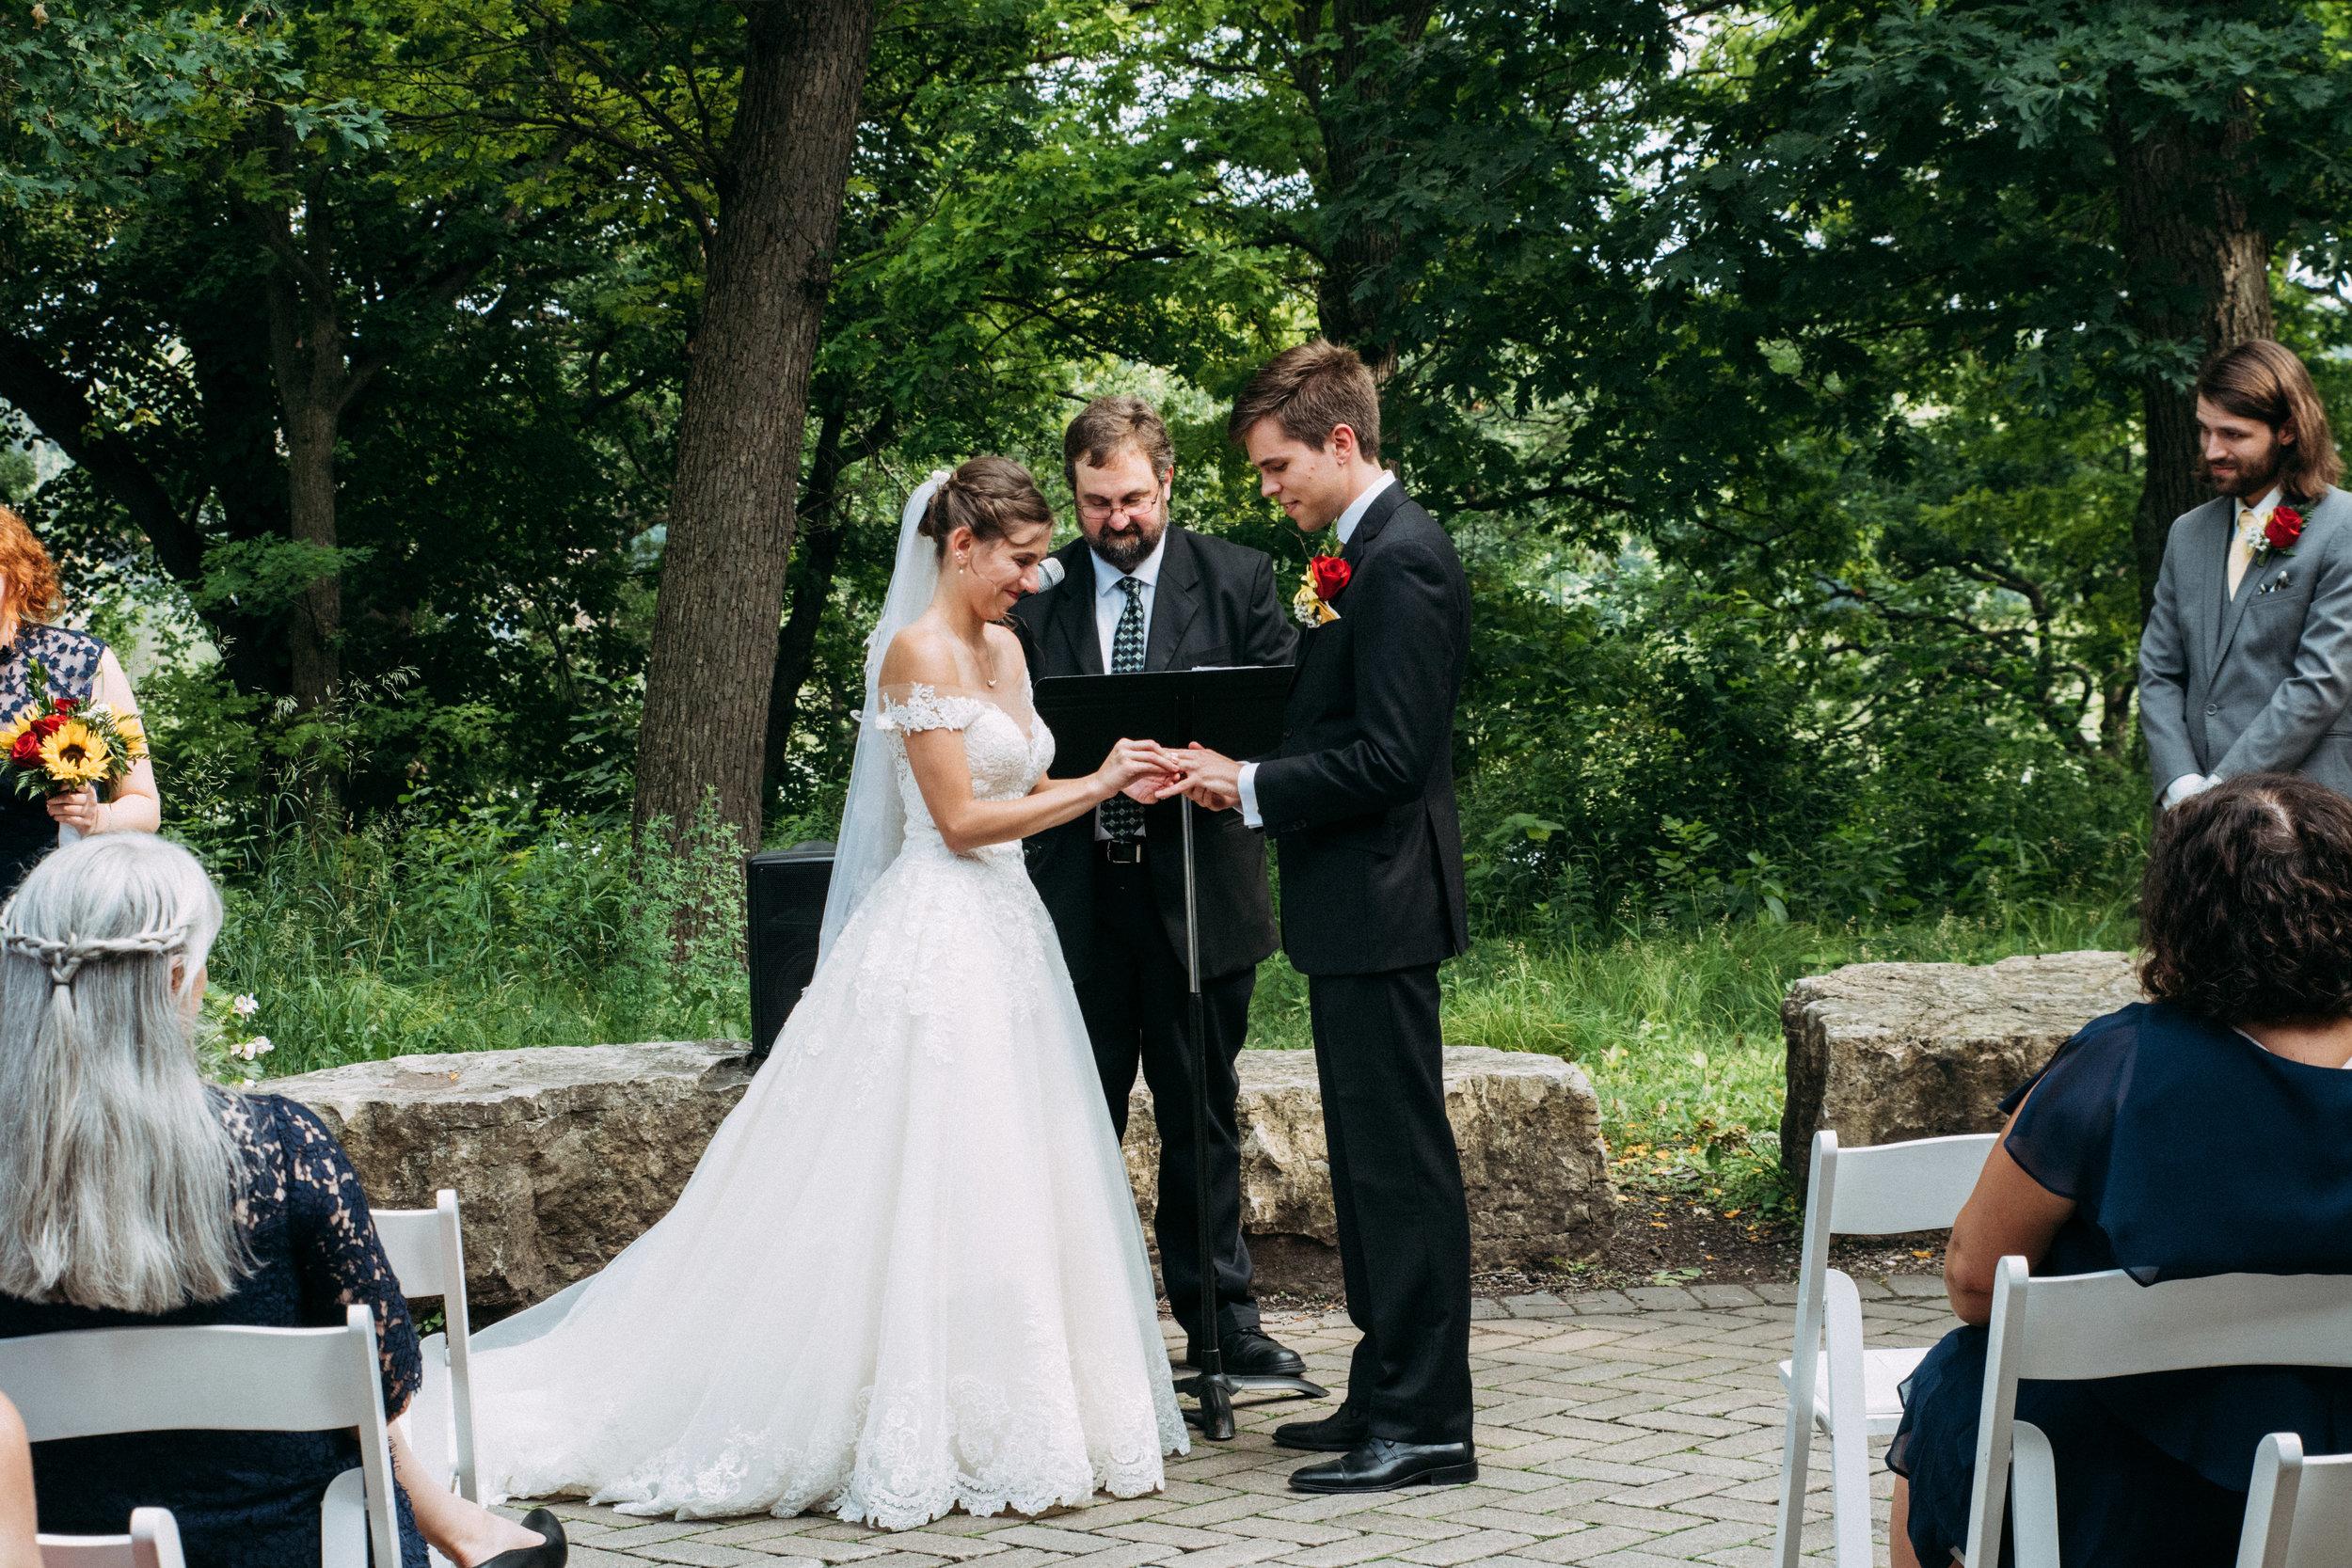 26-Liza_Chris_Minneapolis_Minnesota_Wedding.jpg